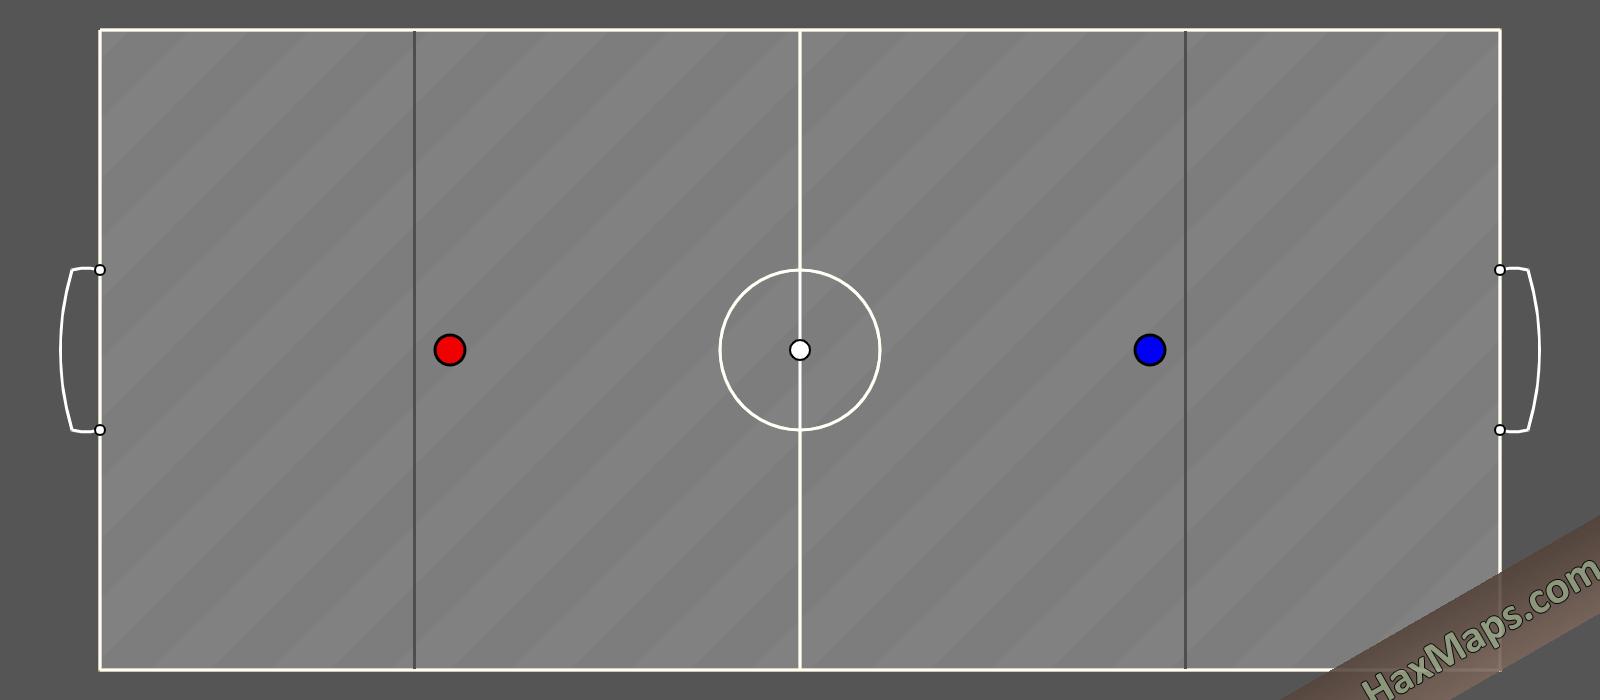 hax ball maps | Futsal x4 with def lines I Maestro